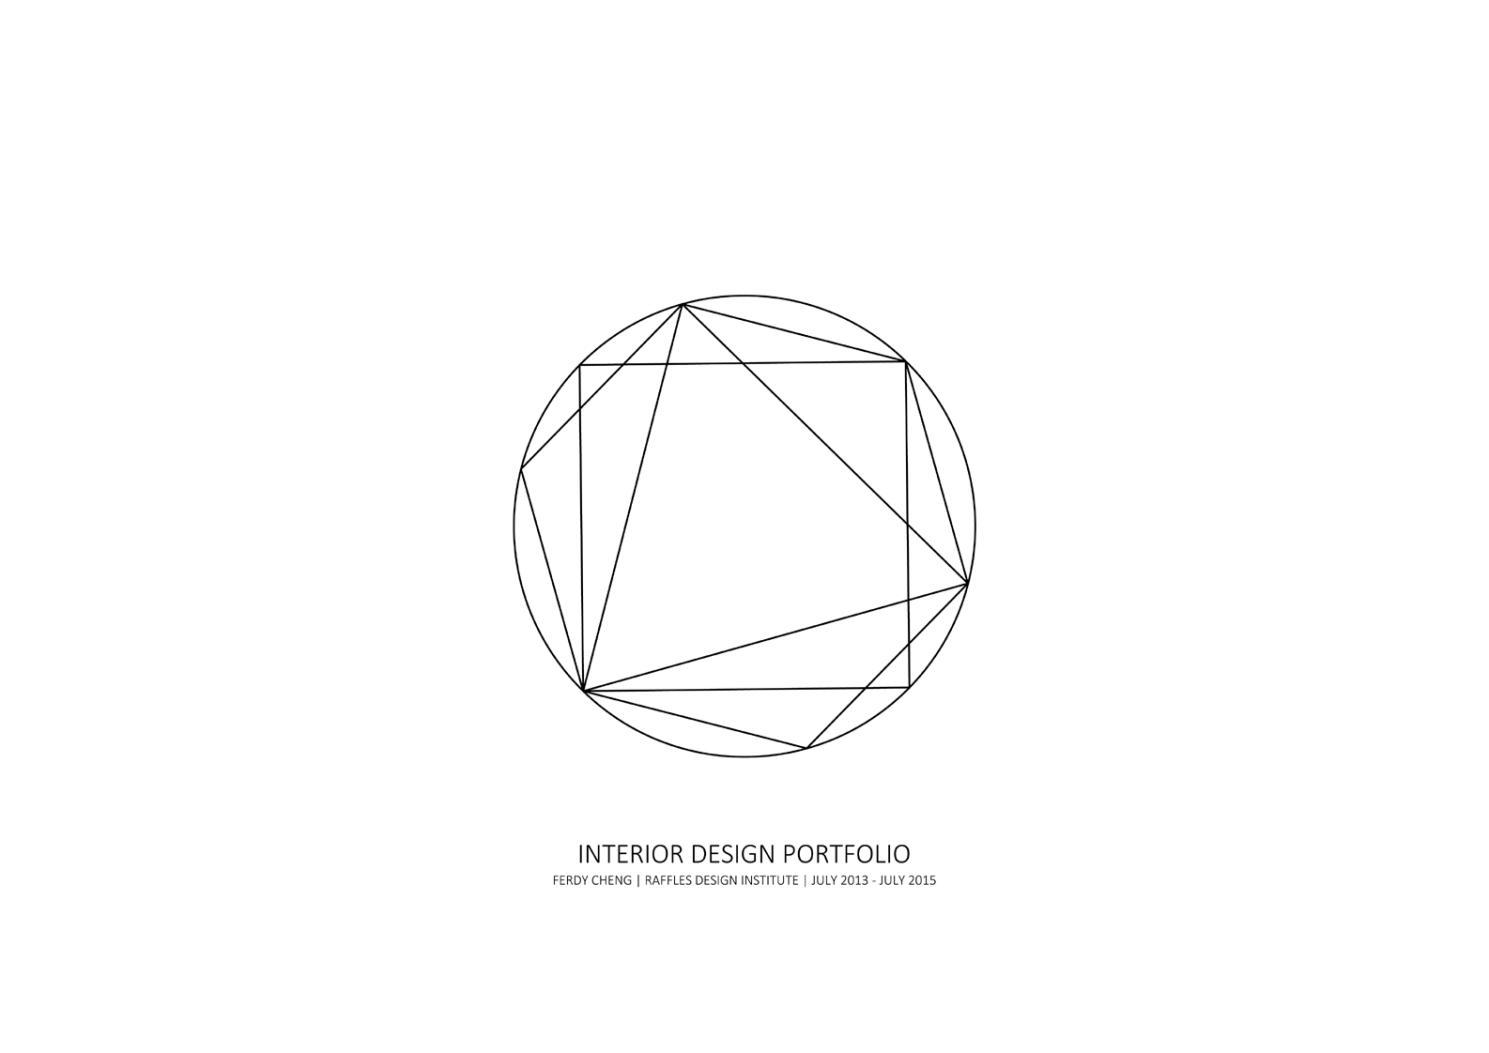 Diploma Portfolio Rdi Sg Ferdy Cheng By Issuu Refrigeration Unit Wiring Diagrams